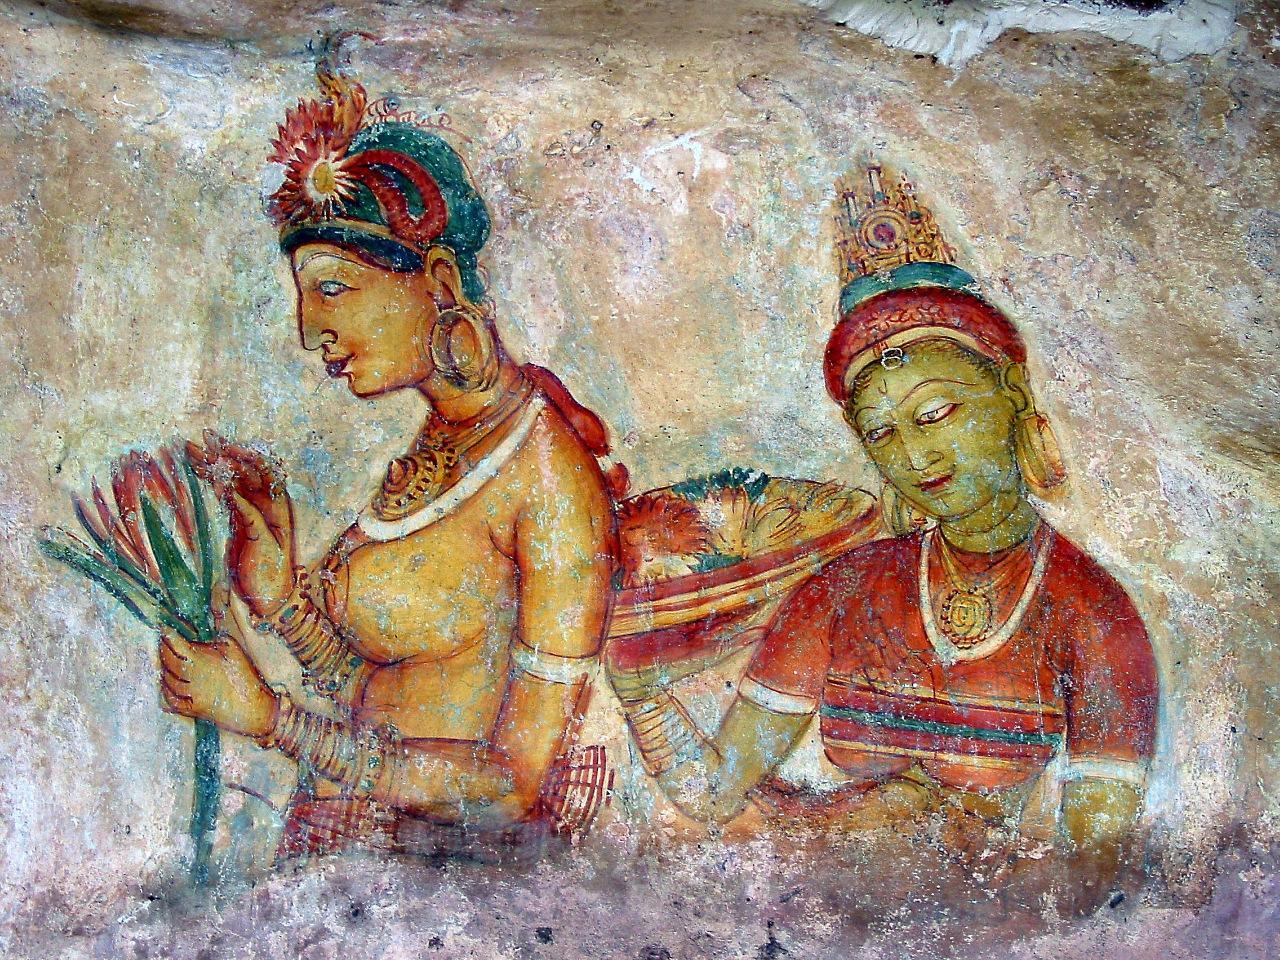 Львиная скала (Sigiriya)